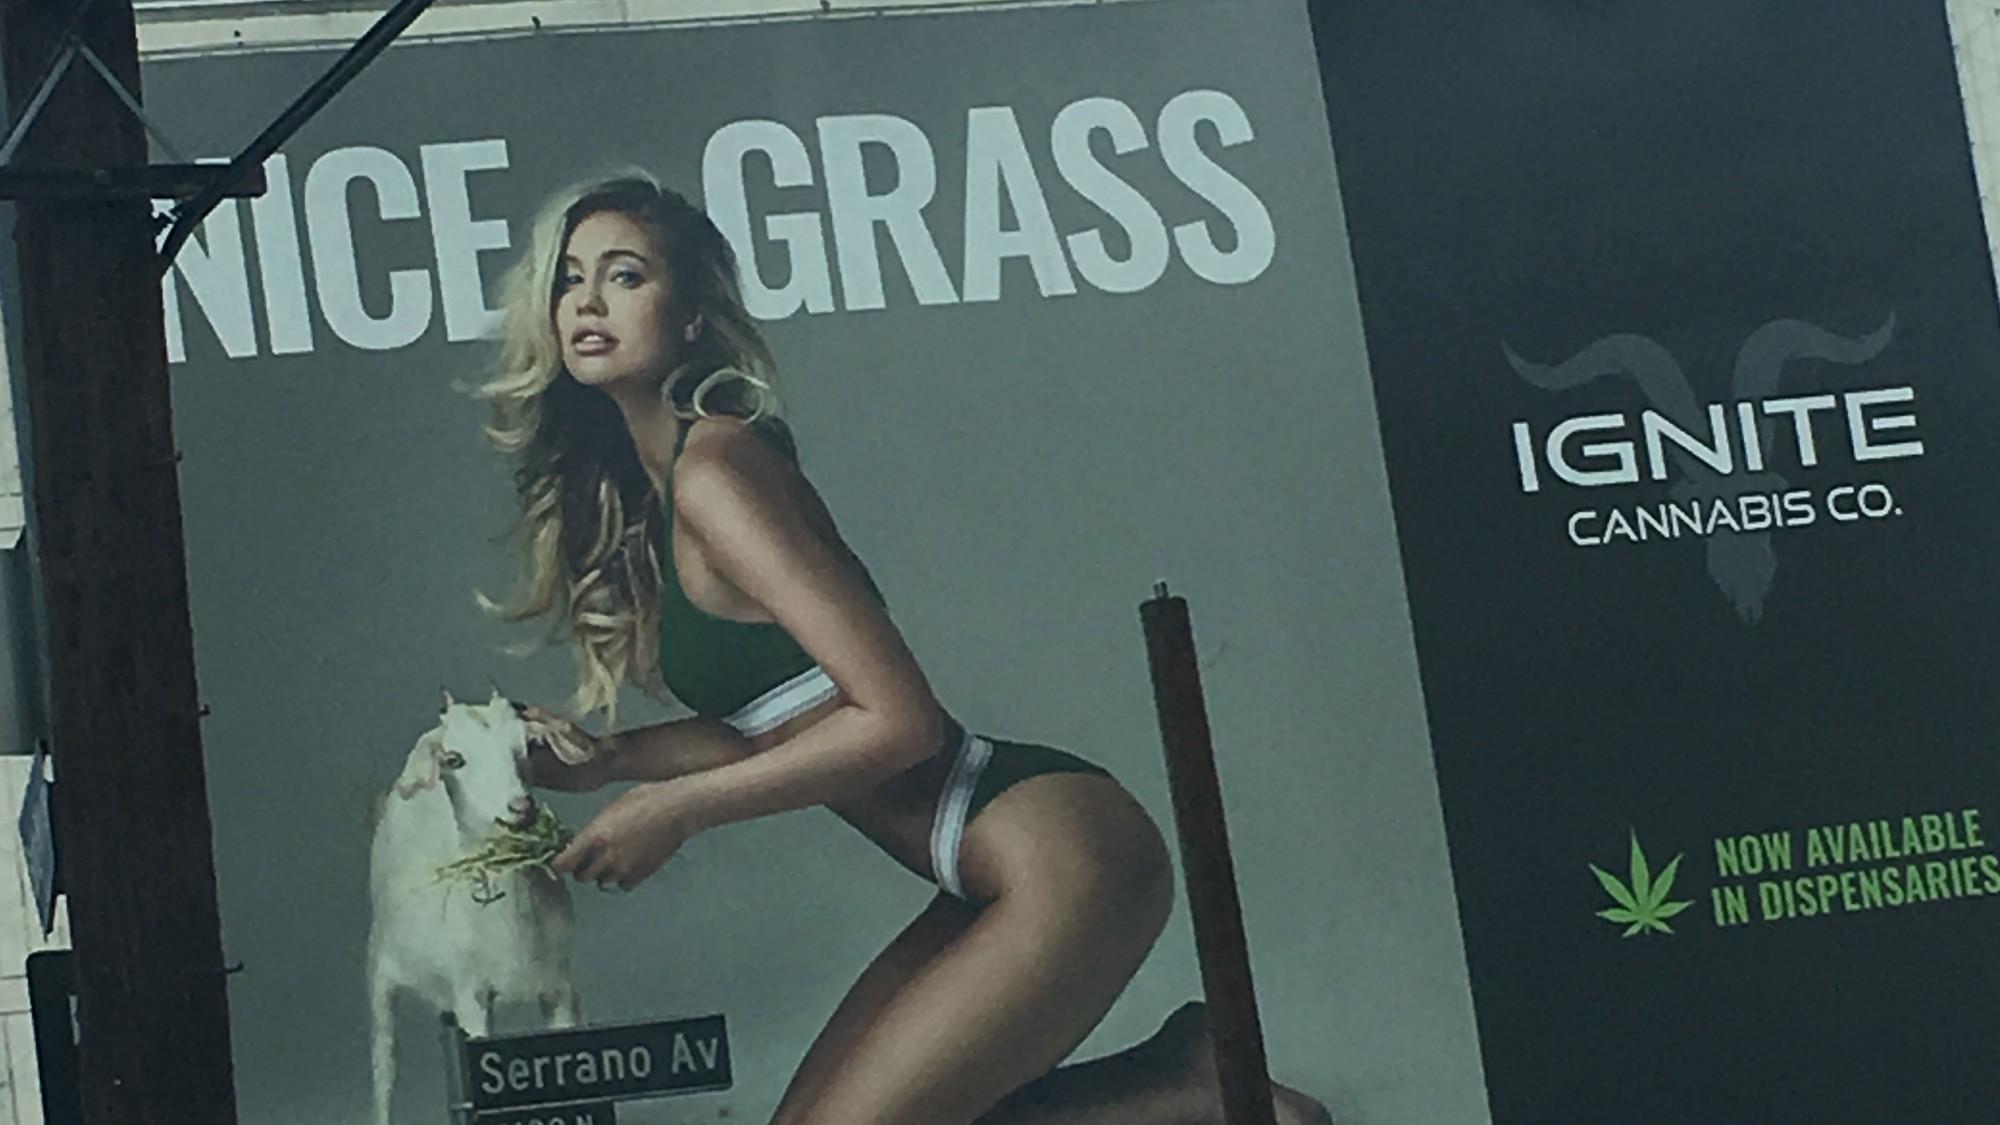 Dan Bilzerian's Weed Company Is Keeping Sexist Cannabis Ads